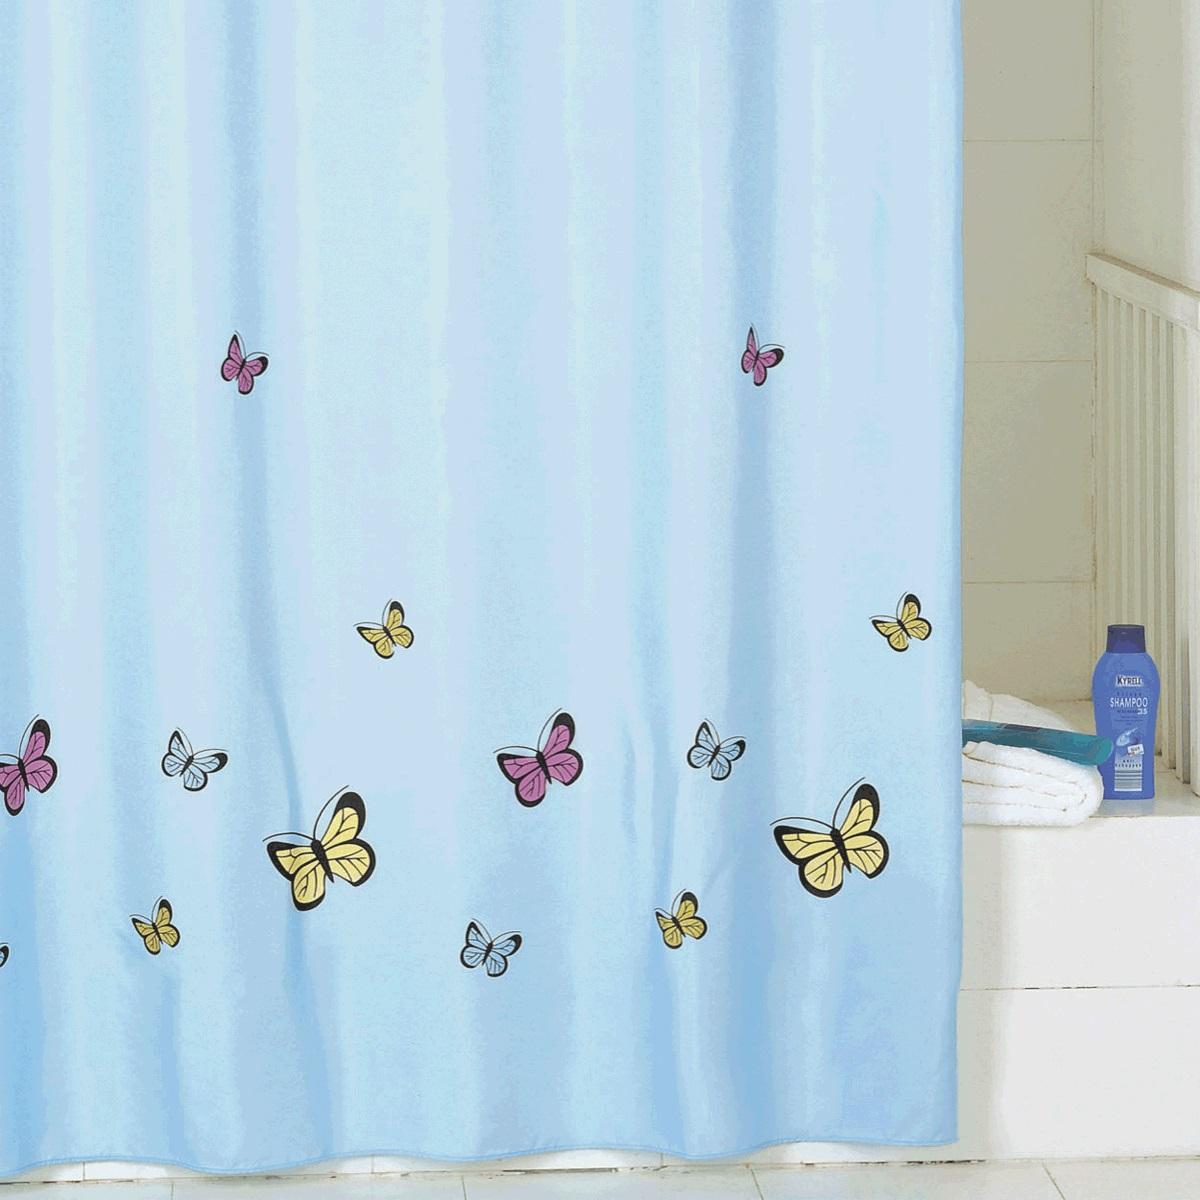 Штора для ванной Iddis Blue Butterfly, цвет: голубой, 200 x 200 см штора для ванной iddis curved lines blue цвет голубой 200 x 200 см